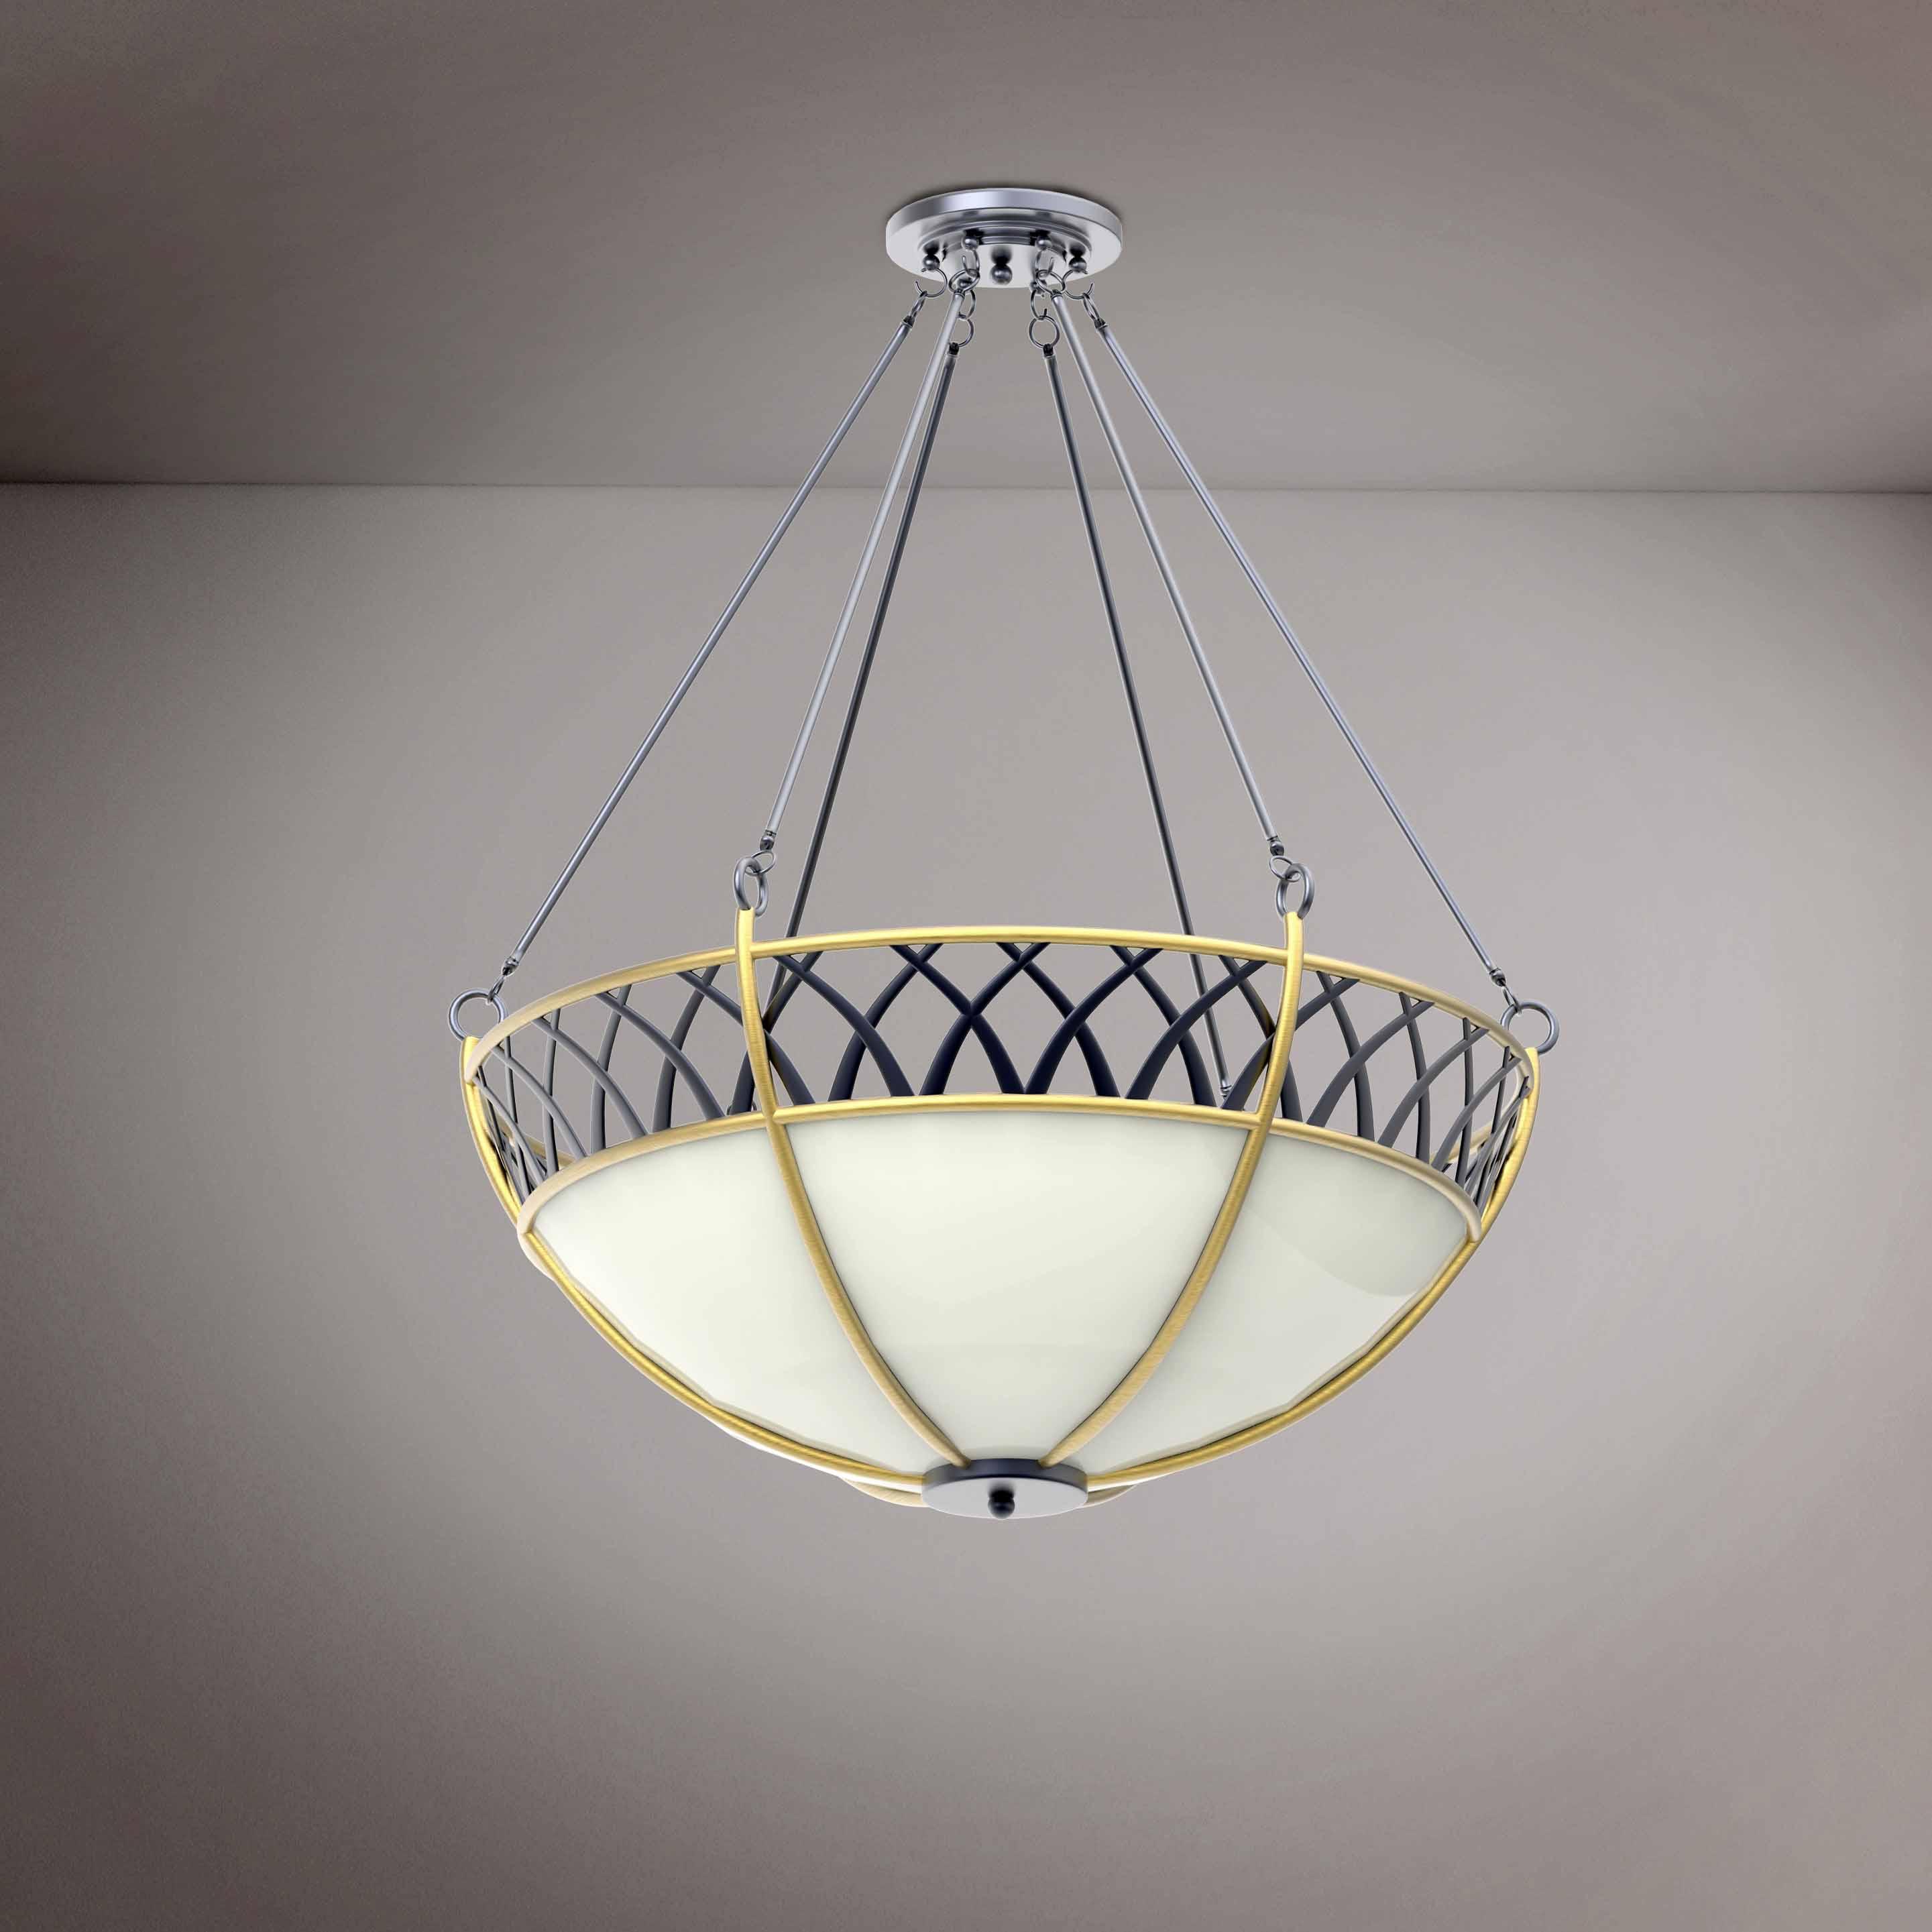 Round Elegant Luxury Chandelier - 3D Product